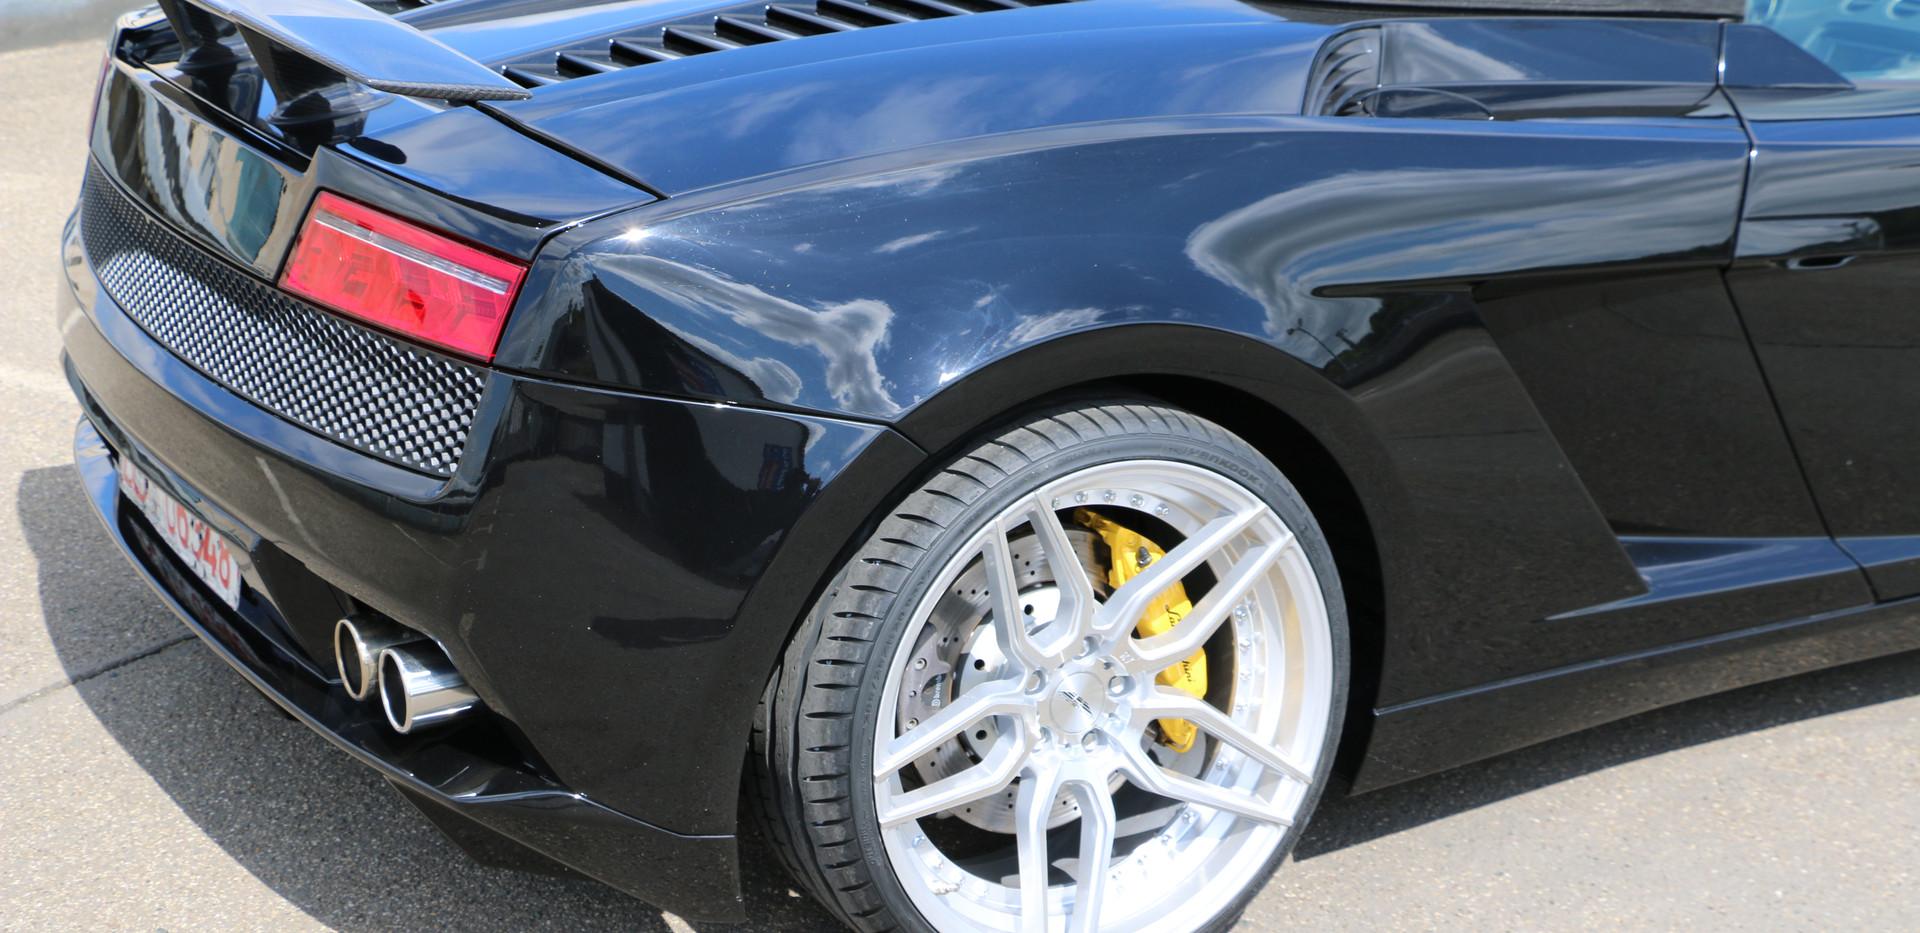 Lamborghini_Gallardo_LP560_schwwarz_R7_s